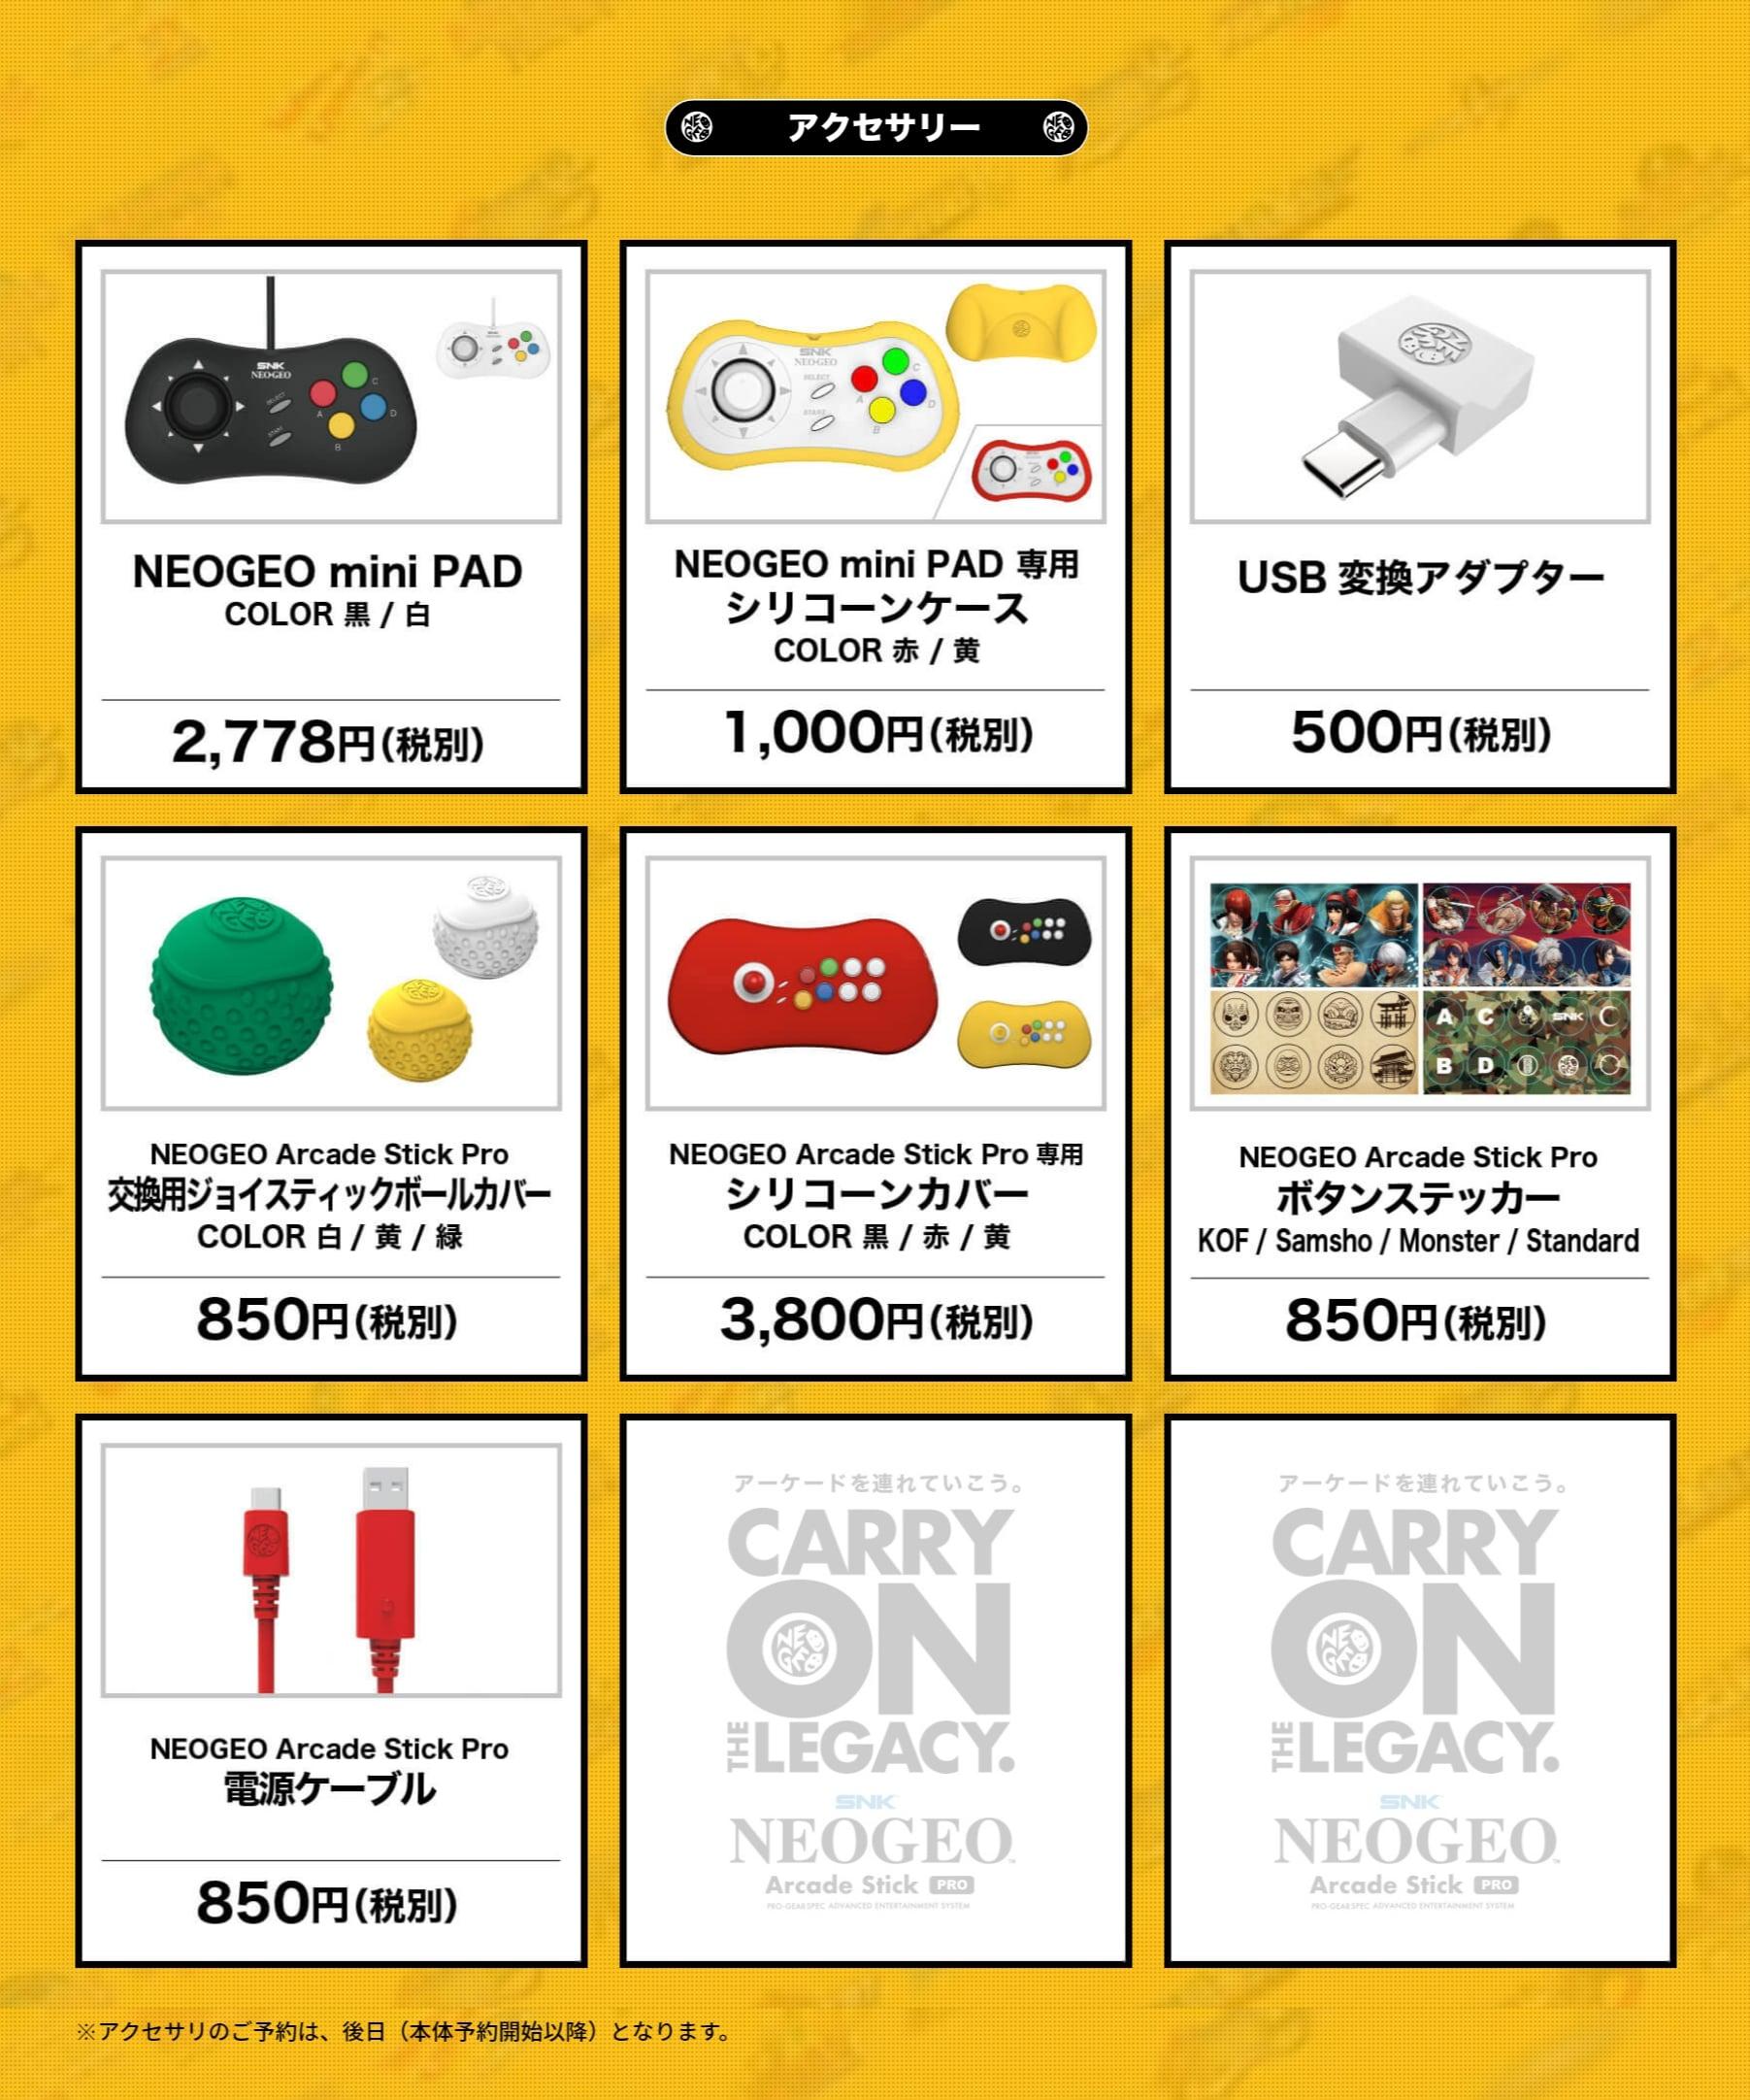 NEOGEO Arcade Stick Pro アクセサリー